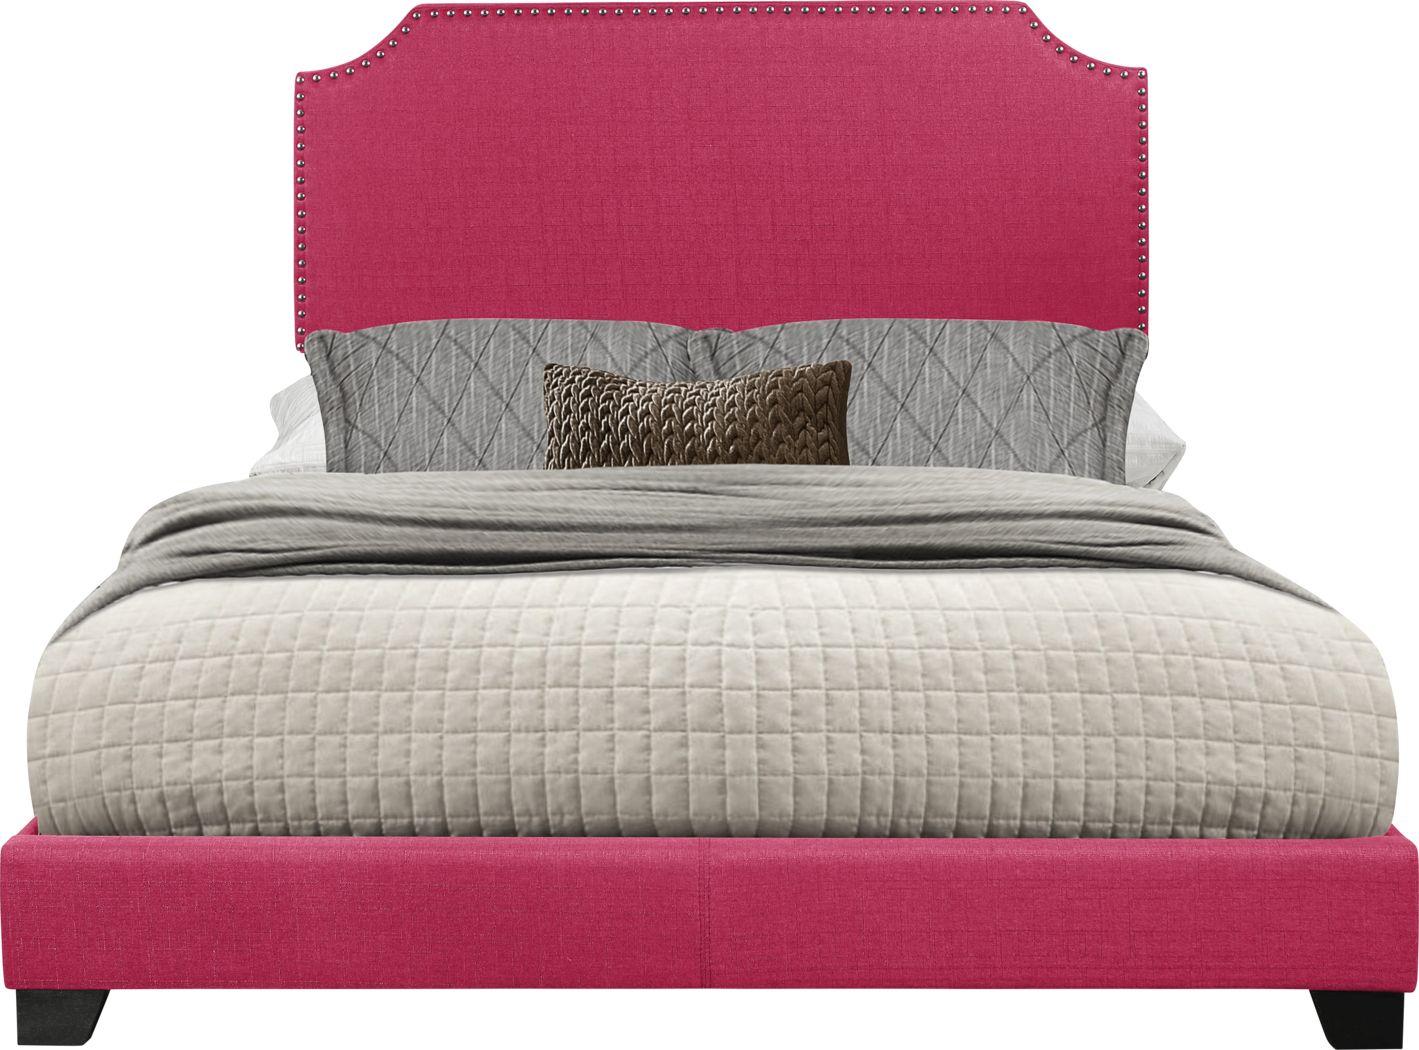 Carshalton Pink King Upholstered Bed